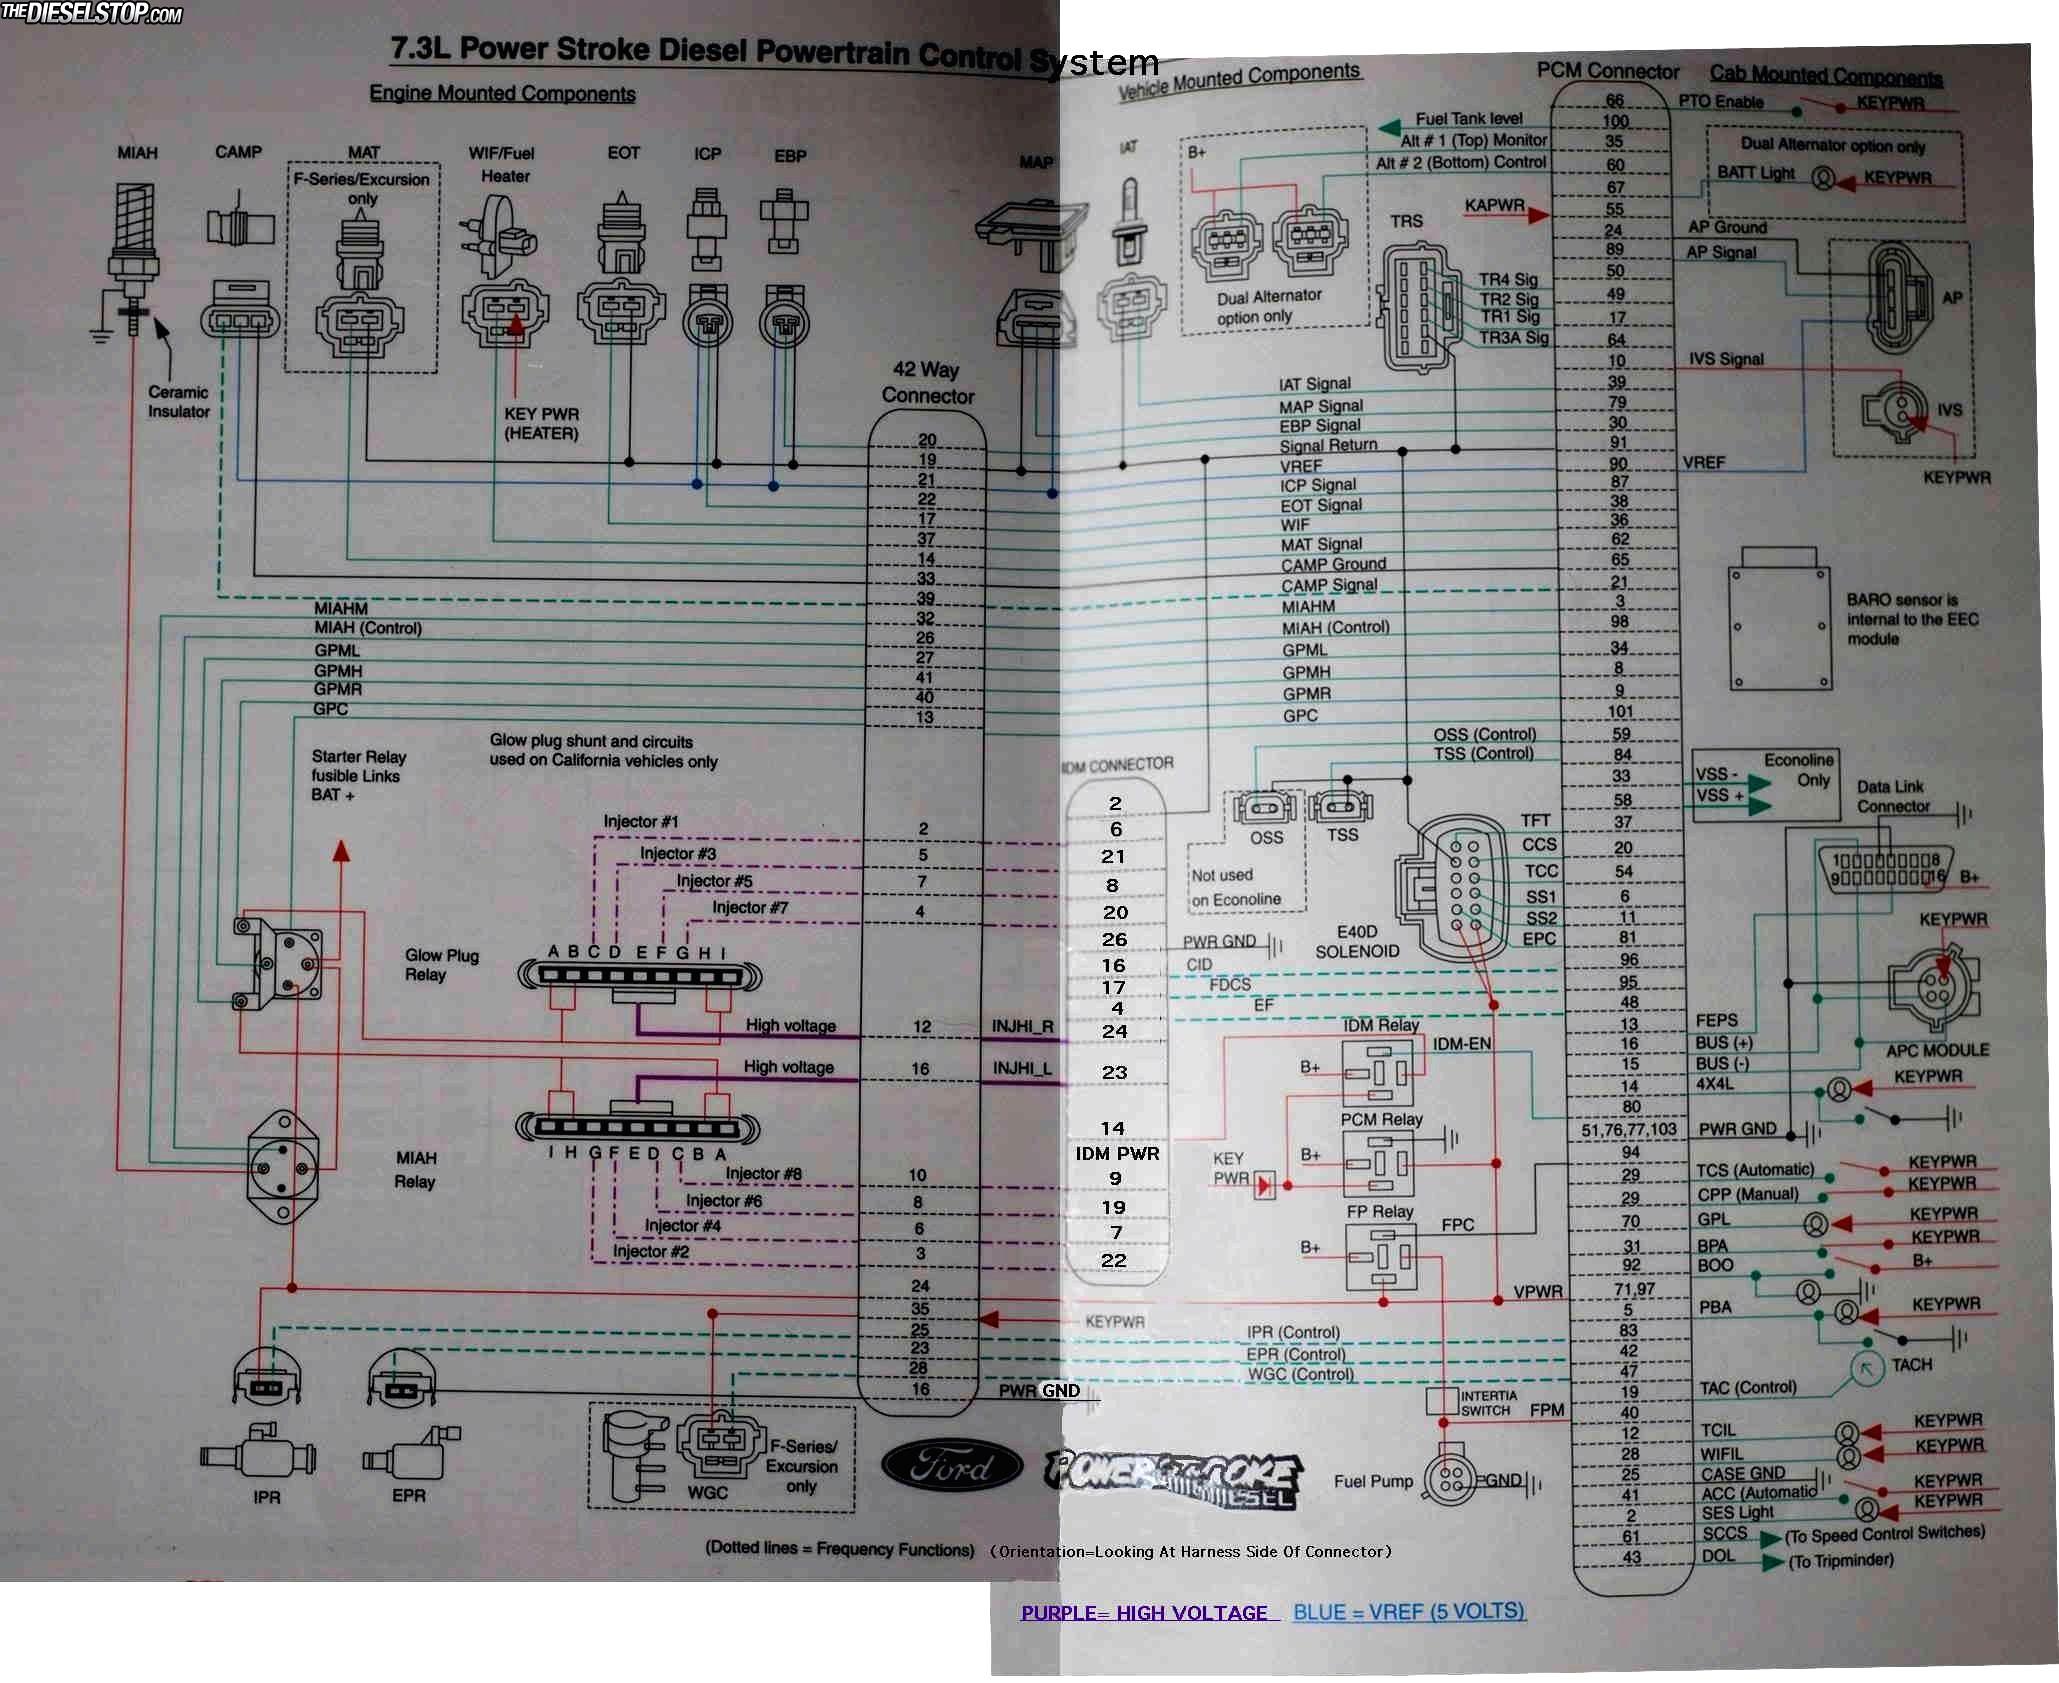 6 0 Powerstroke Oil Temp Sensor Location in addition 2004 Duramax Fuel Pump Location also 2006 Ford F350 6 0 Dual Alternator Wiring Diagram further IPR Ford 6 0 Diesel Wiring Diagram together with Ford 6 0 Wiring Diagram. on 6 0 powerstroke wiring diagram starting